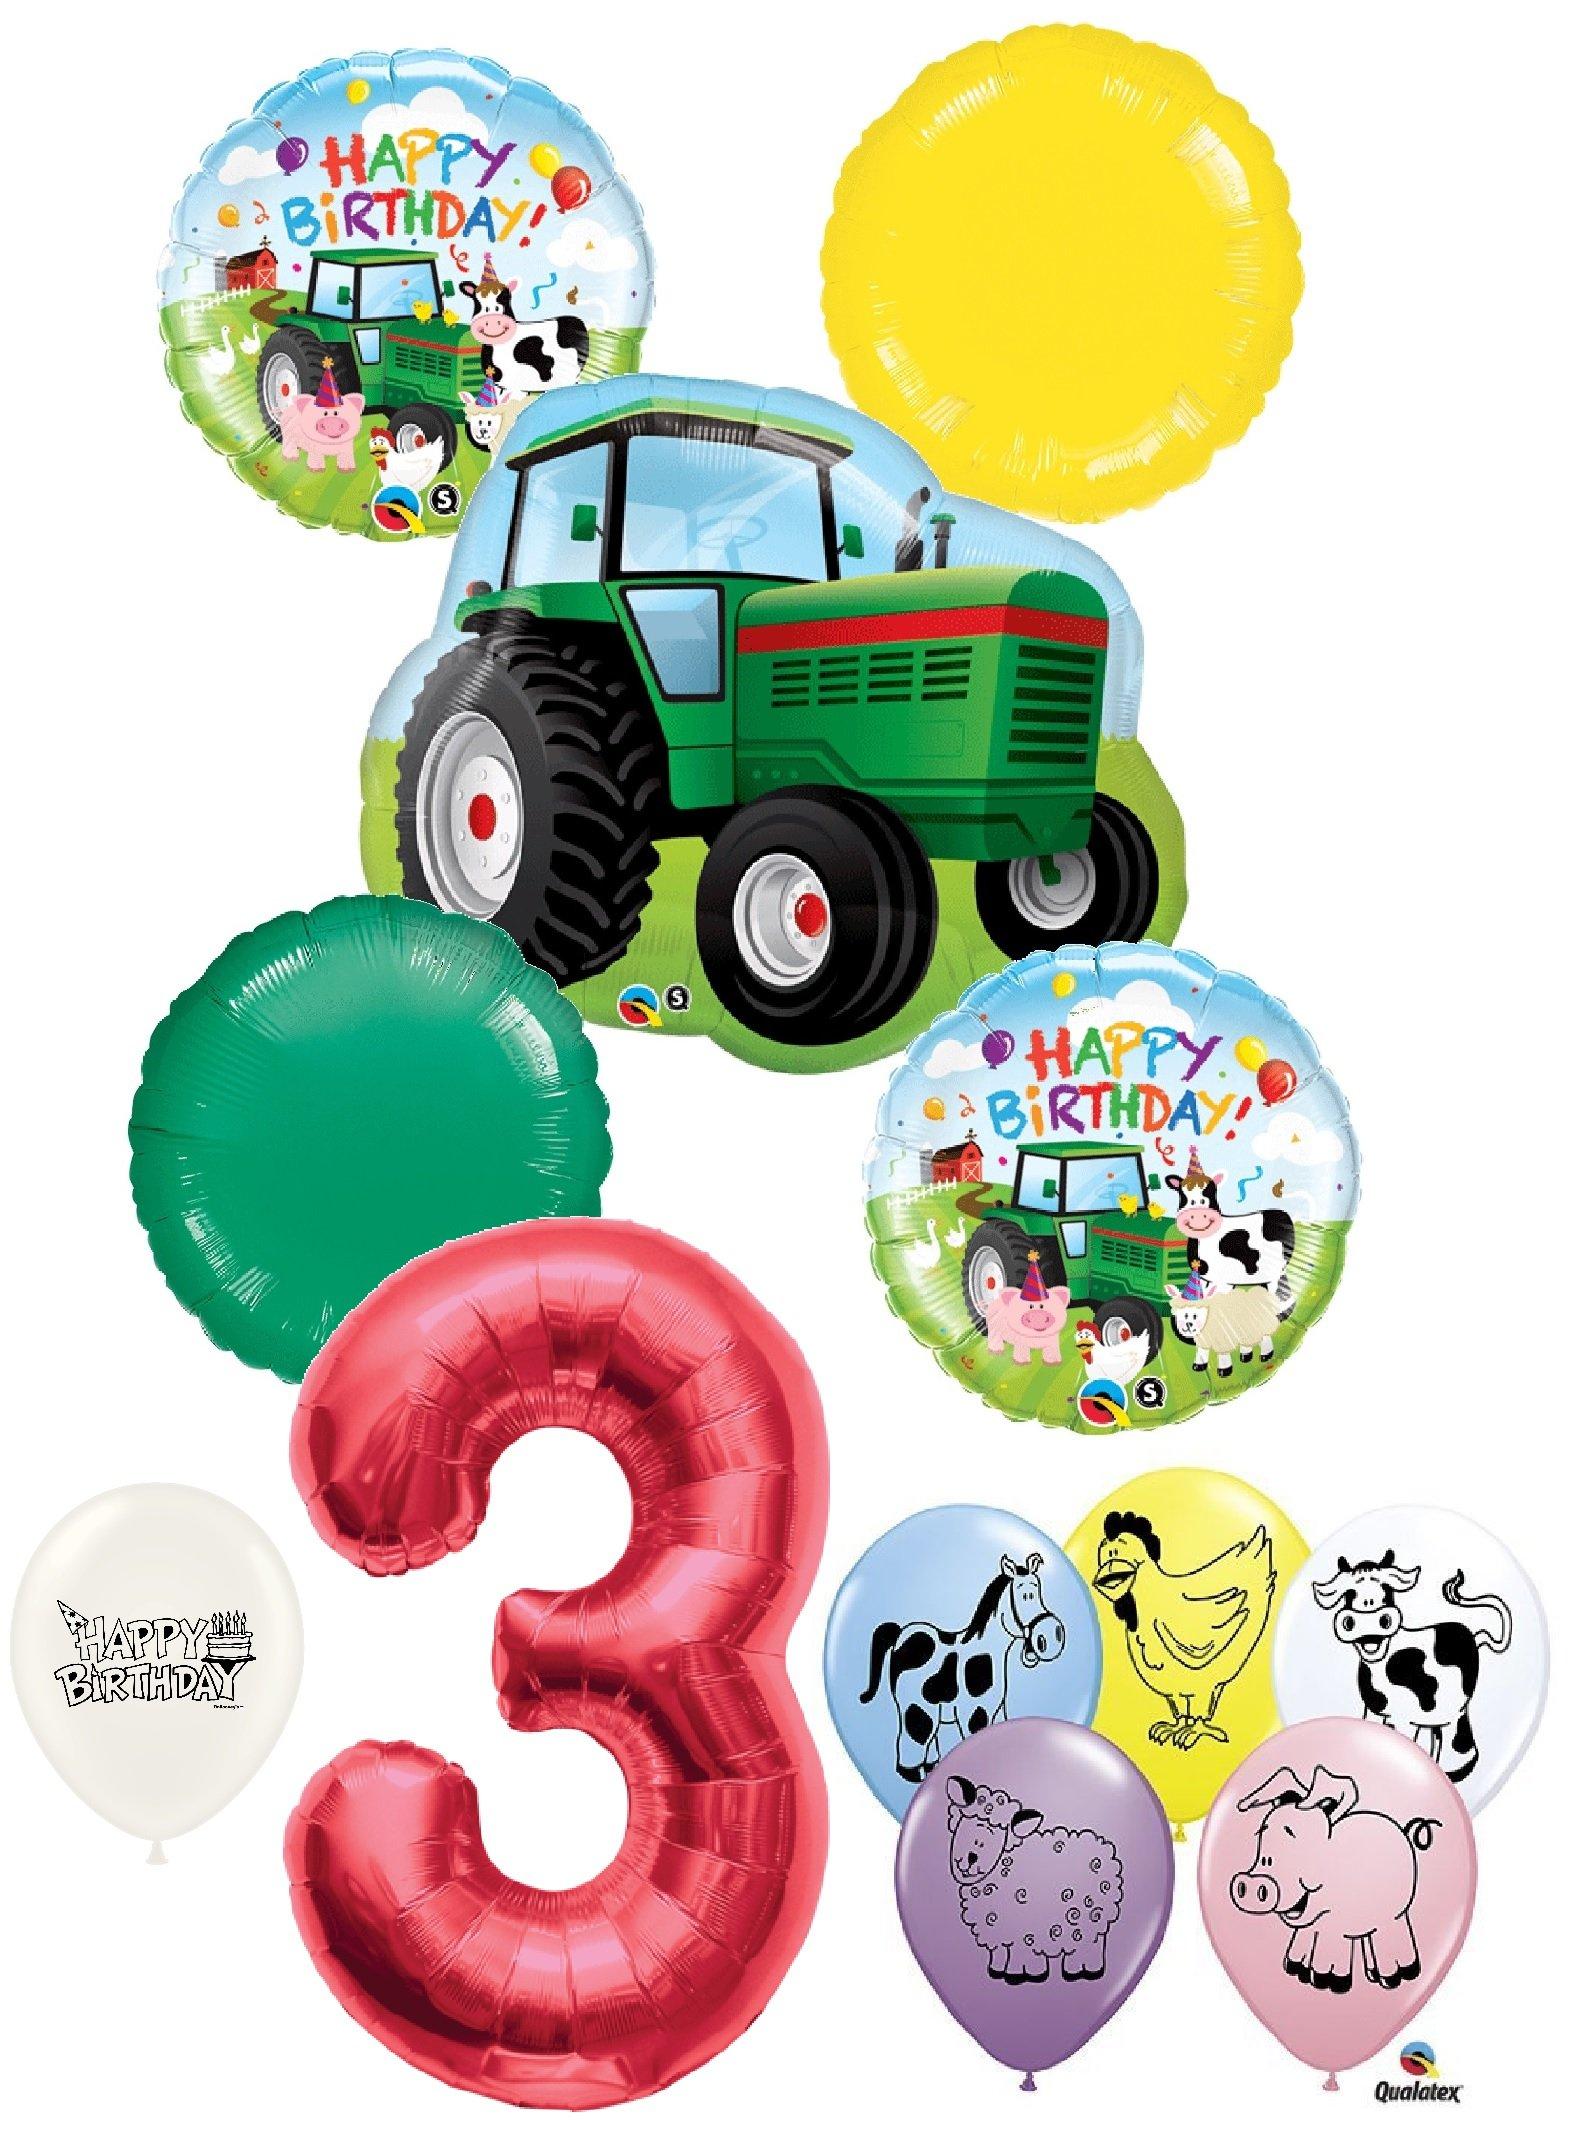 3rd Birthday Barnyard Farm Animals Tractor Party Decorations Balloon Bouquet Bundle